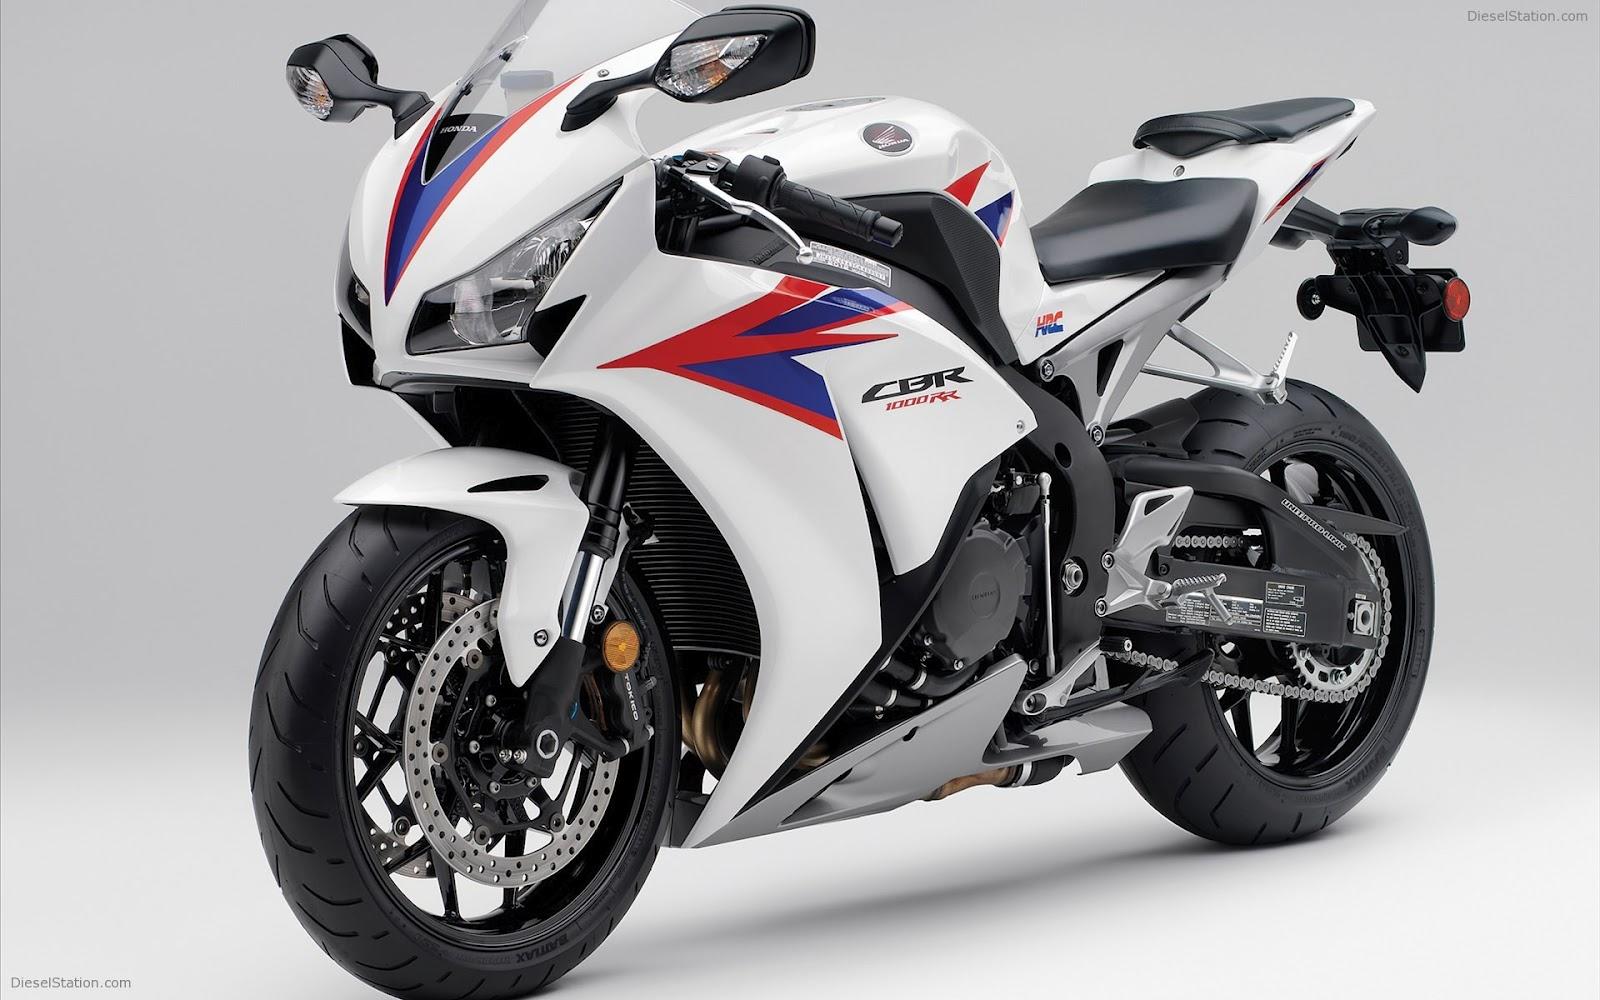 honda cbr1000rr 2012 white front